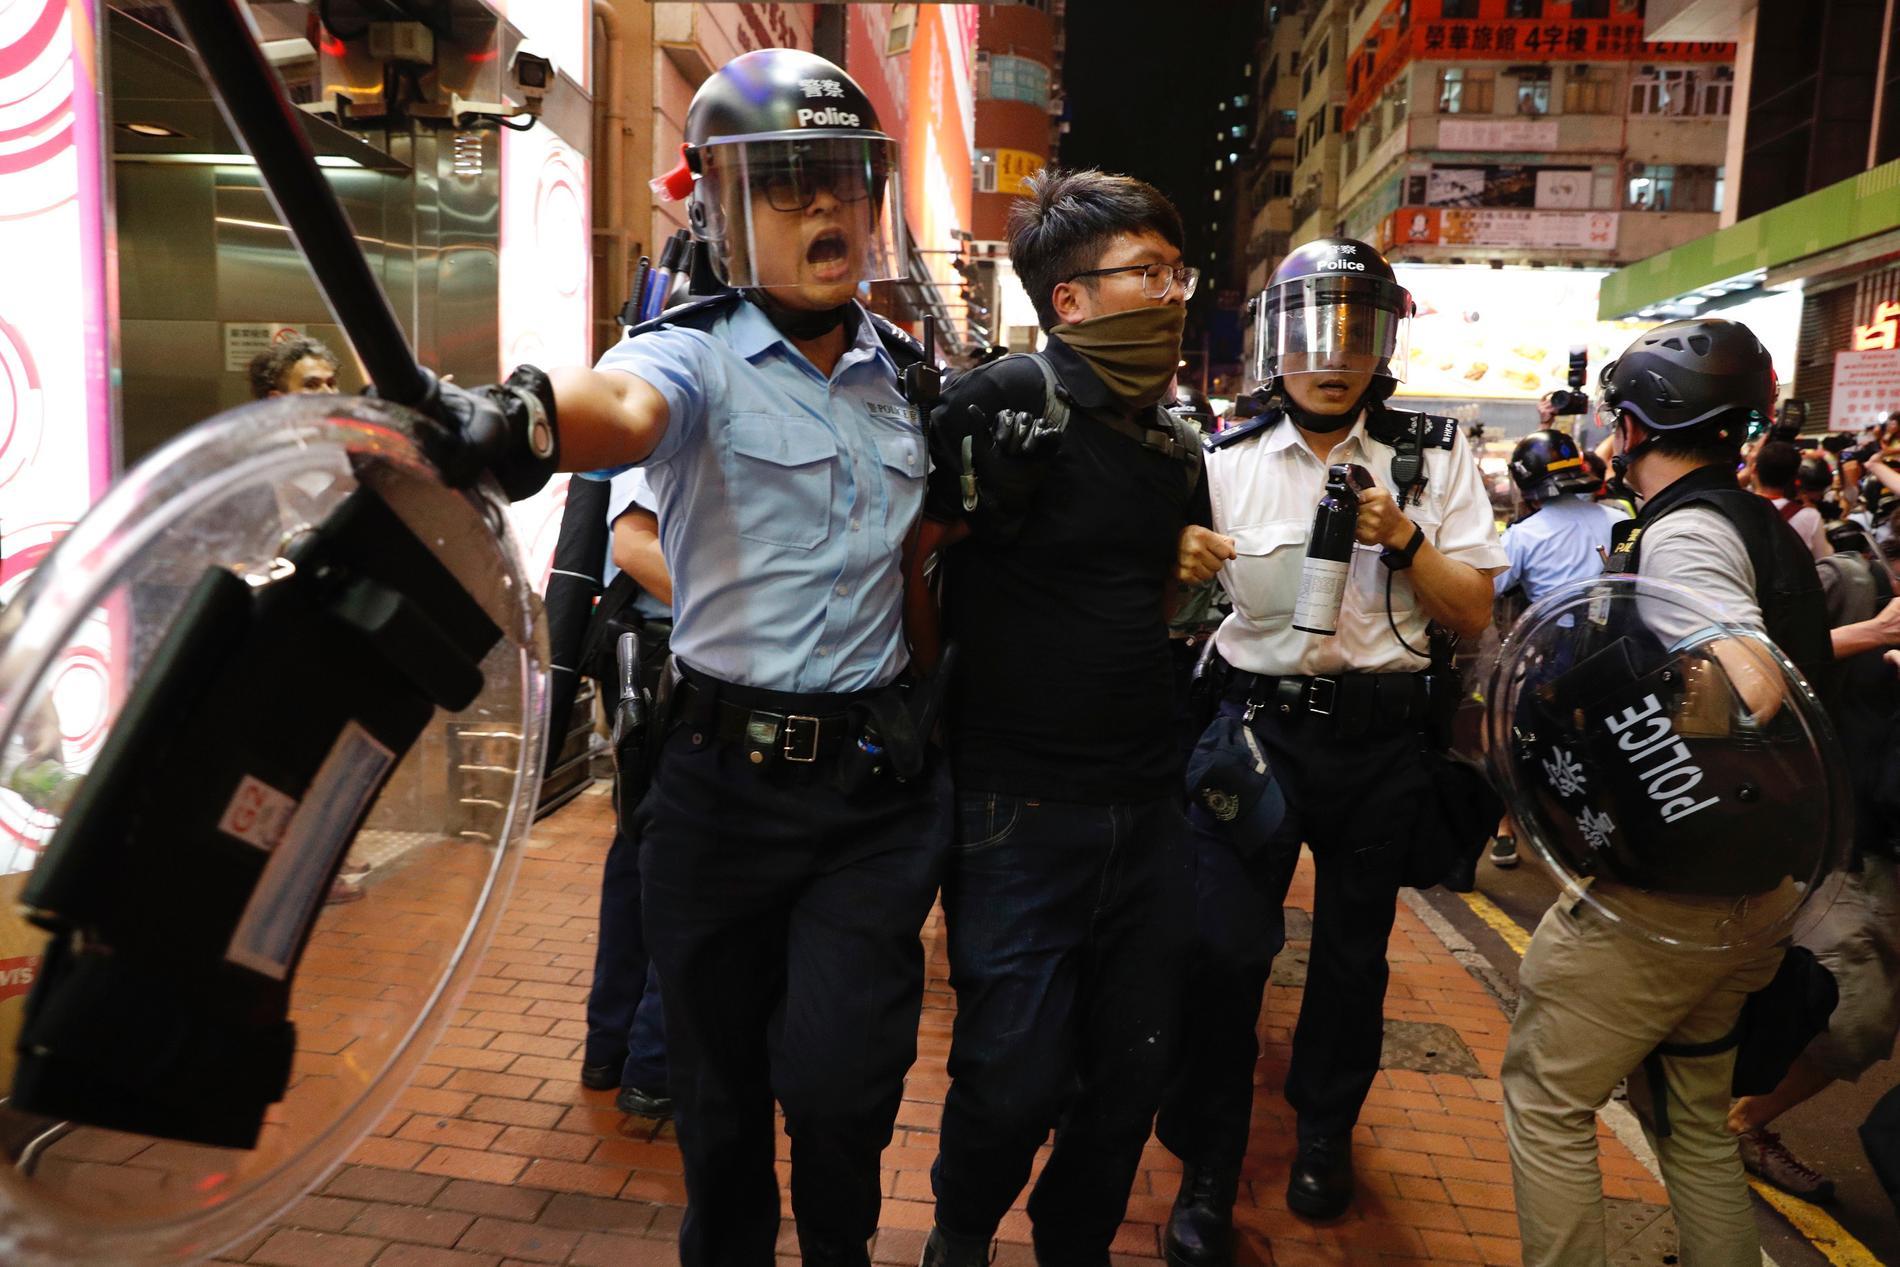 Polis i Hongkong grep minst fem personer under söndagens demonstrationer.